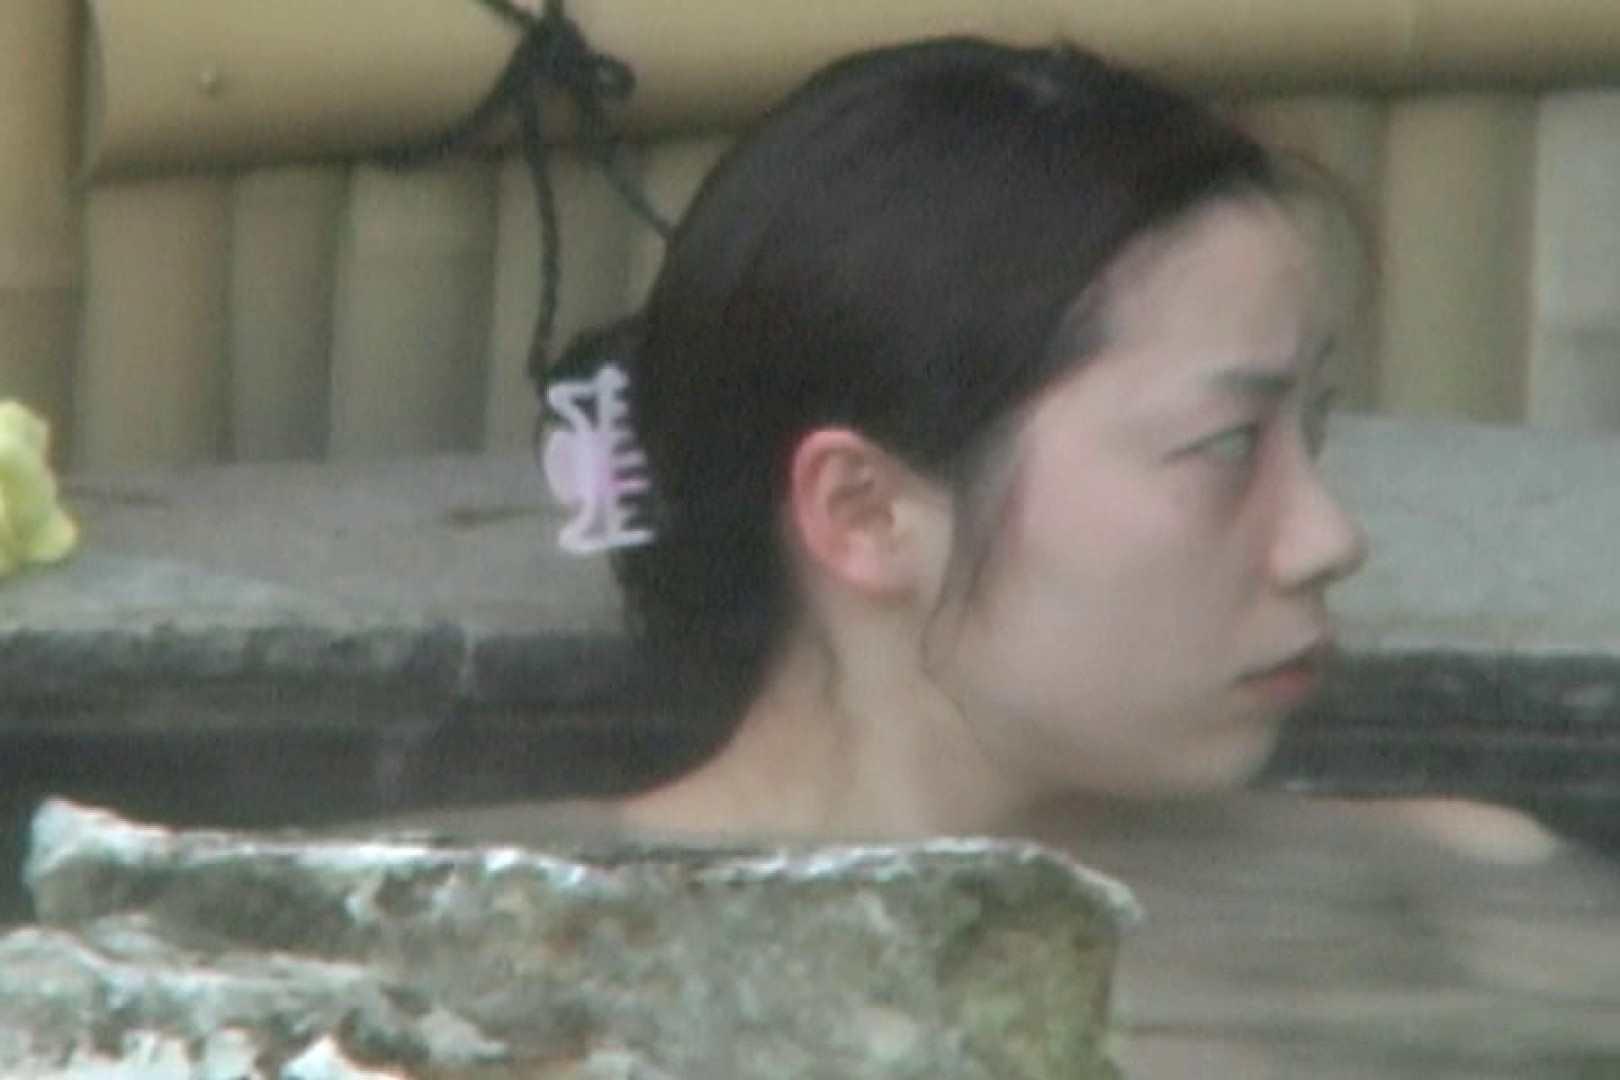 Aquaな露天風呂Vol.596 OLセックス | 盗撮  77画像 16